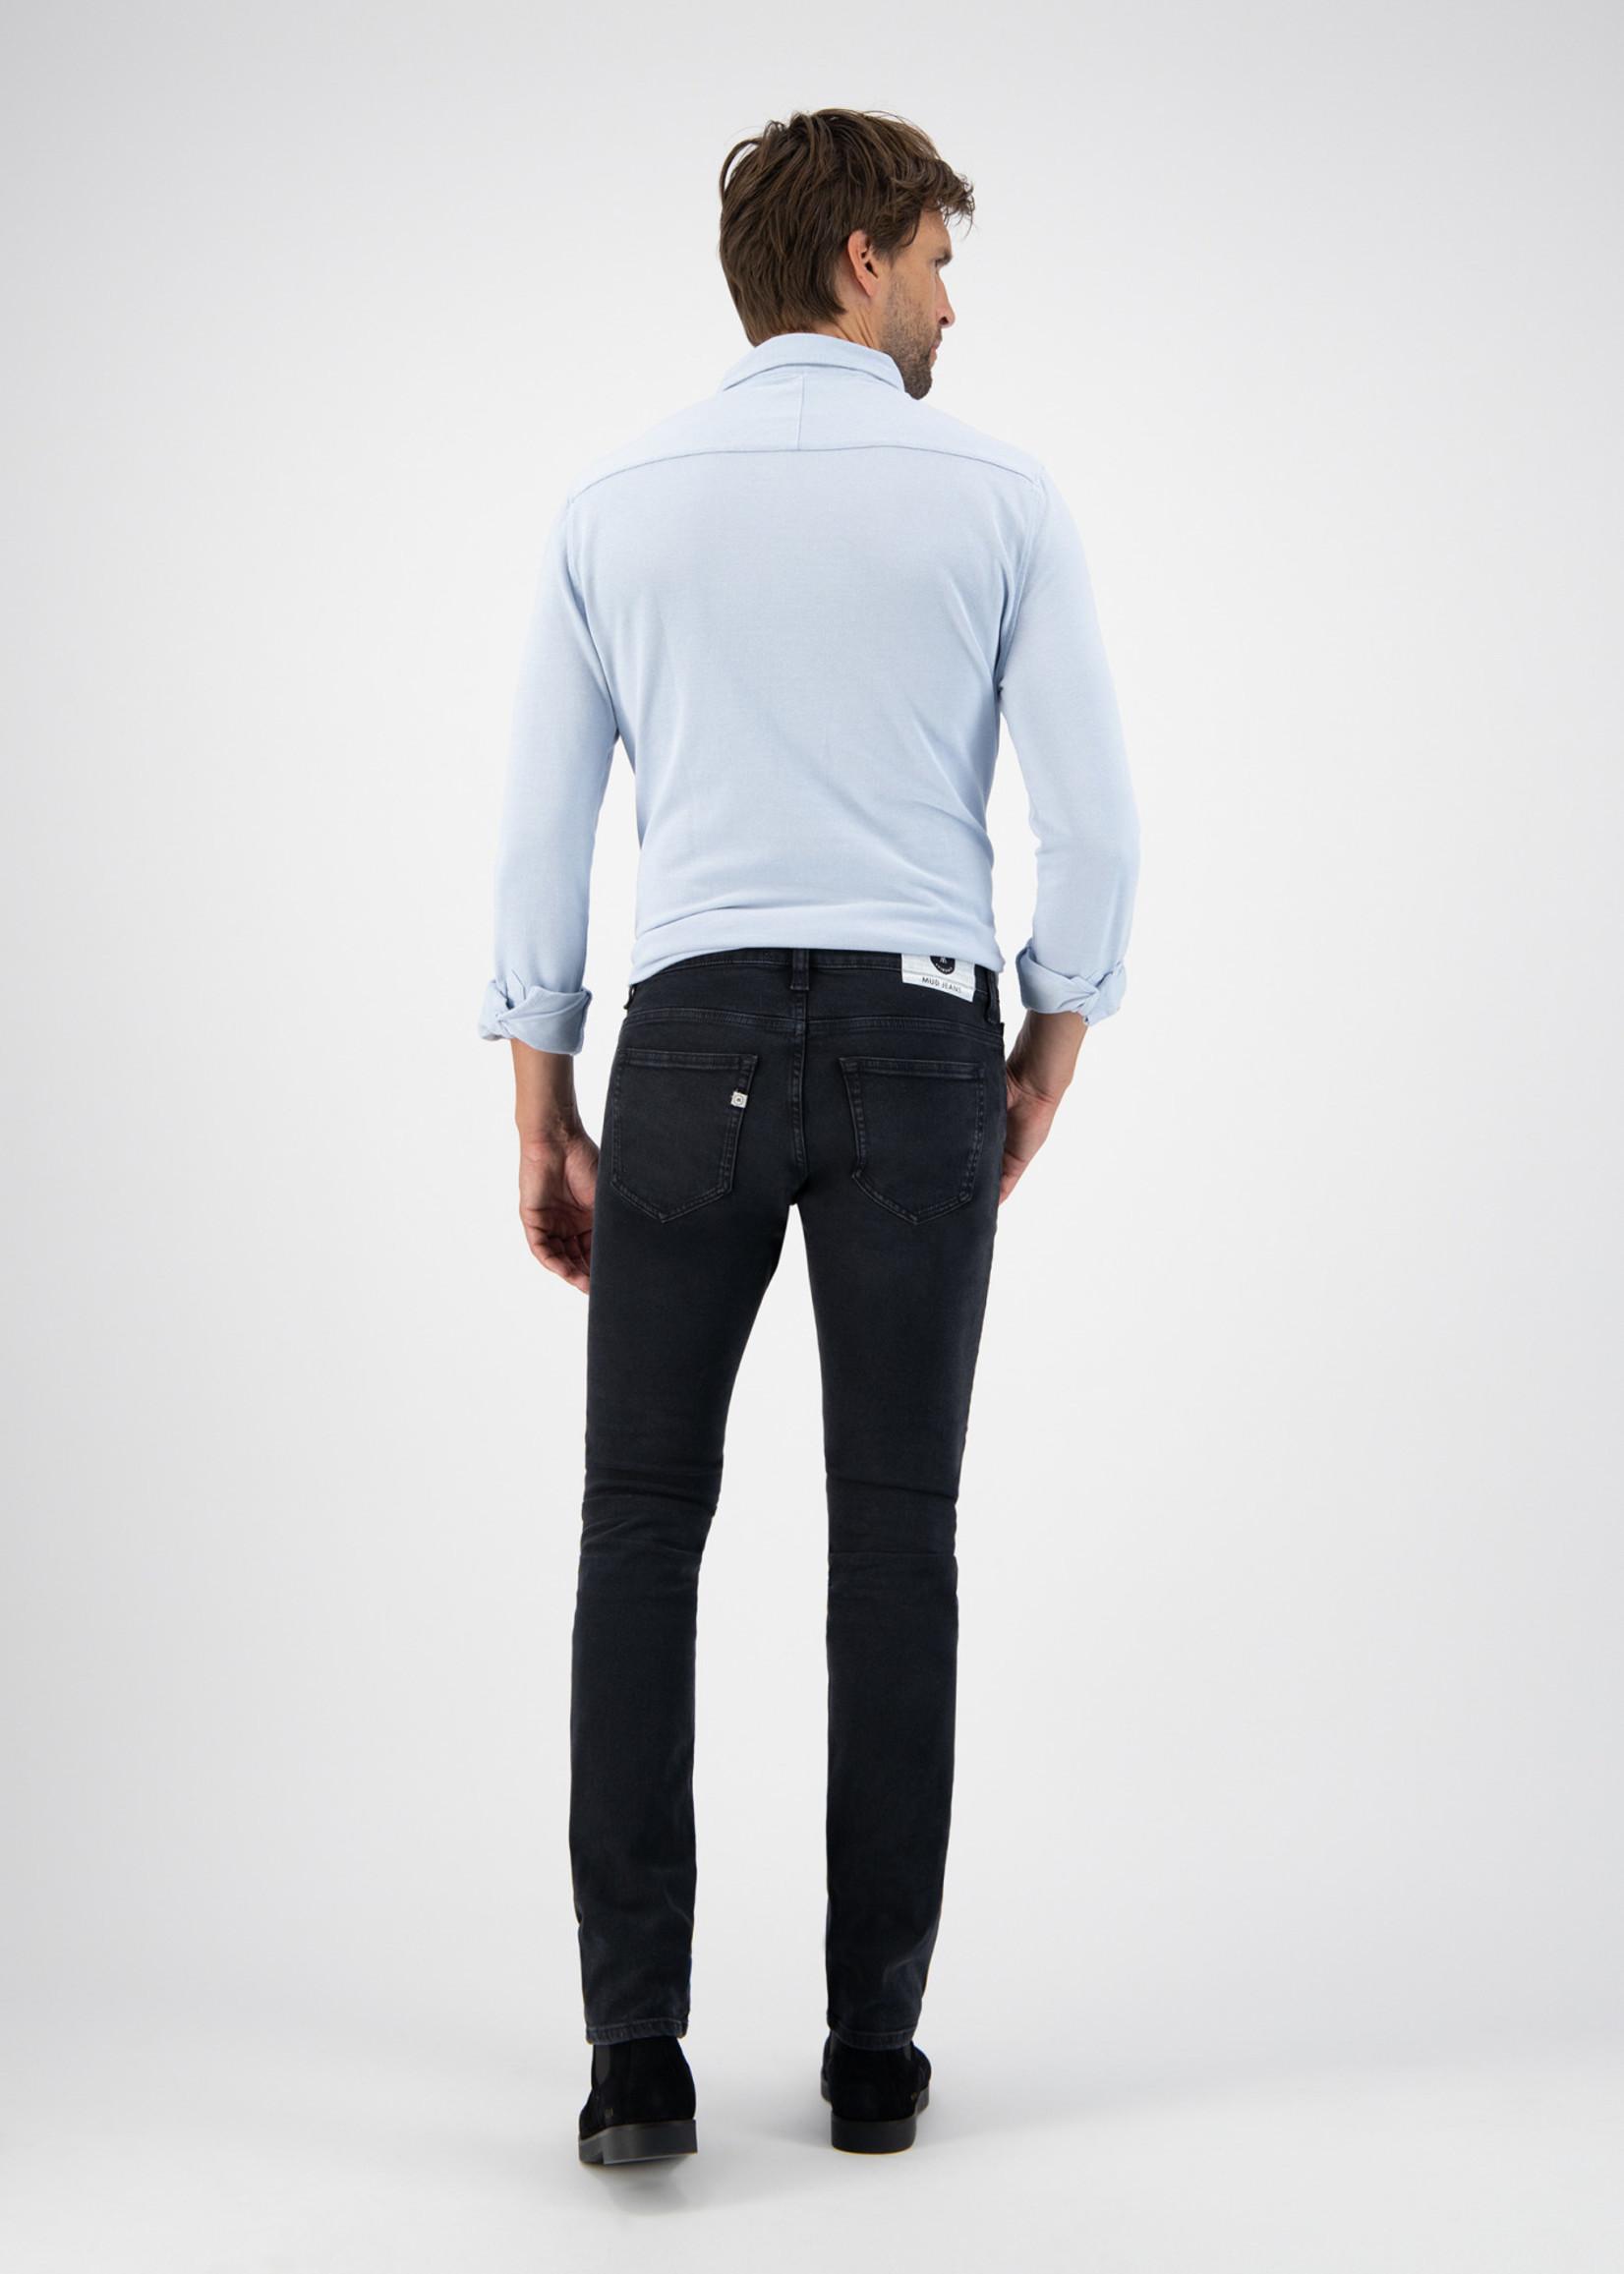 MUD Jeans MUD Jeans - Slim Lassen - Stone Black